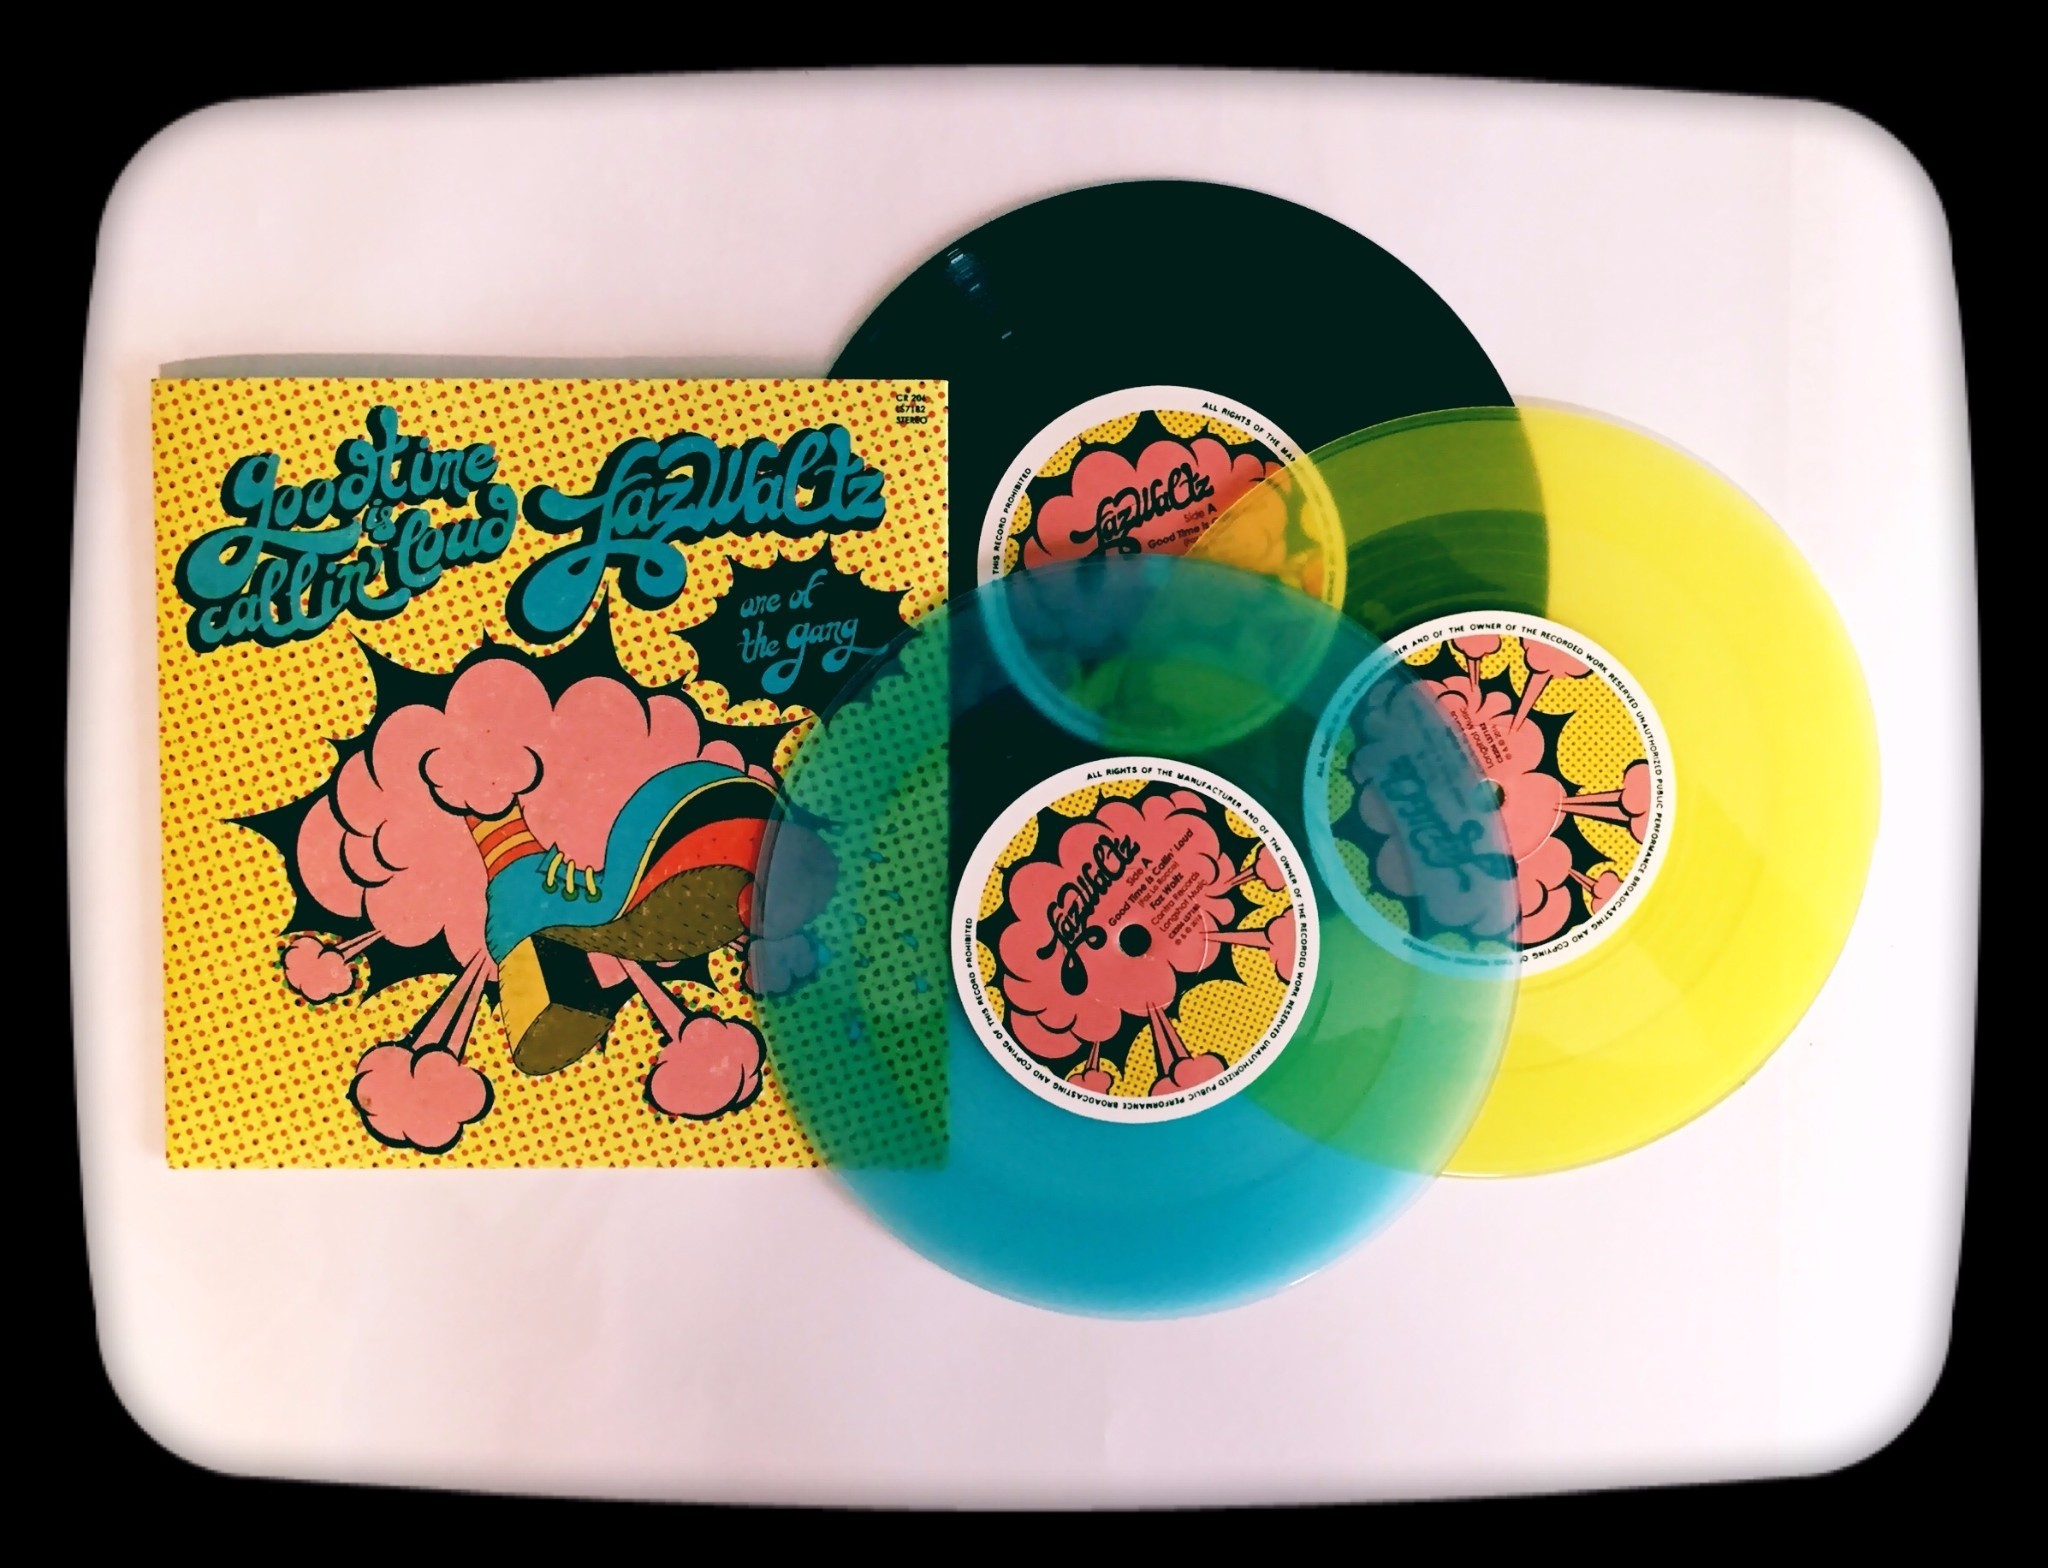 "FAZ WALTZ-Good Time is Callin' Loud 3x7""EP #package deal"